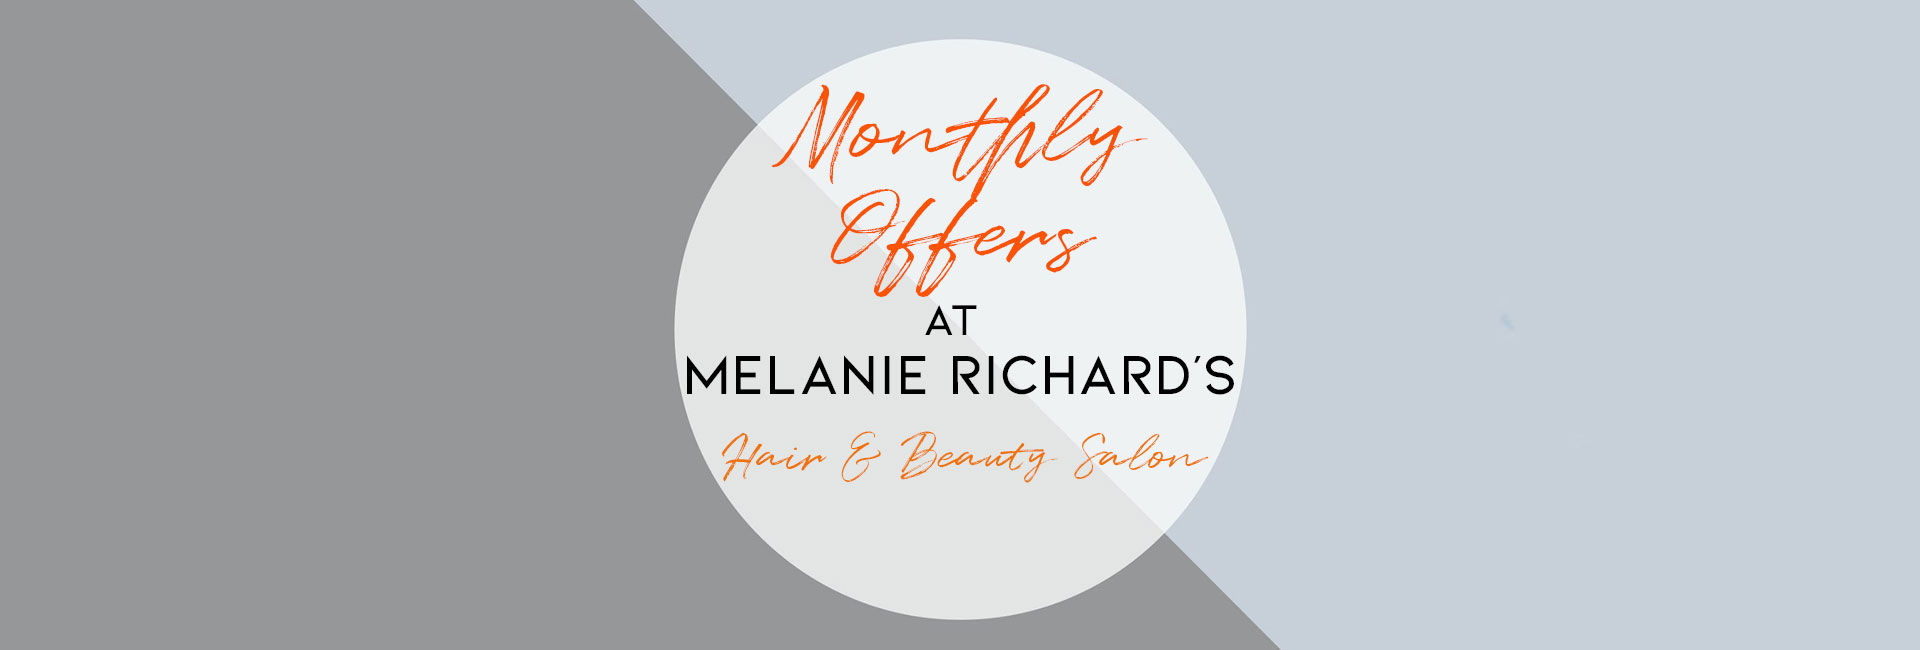 Monthly Beauty Deals At Melanie Richard's Hair & Beauty Salon, Peterborough